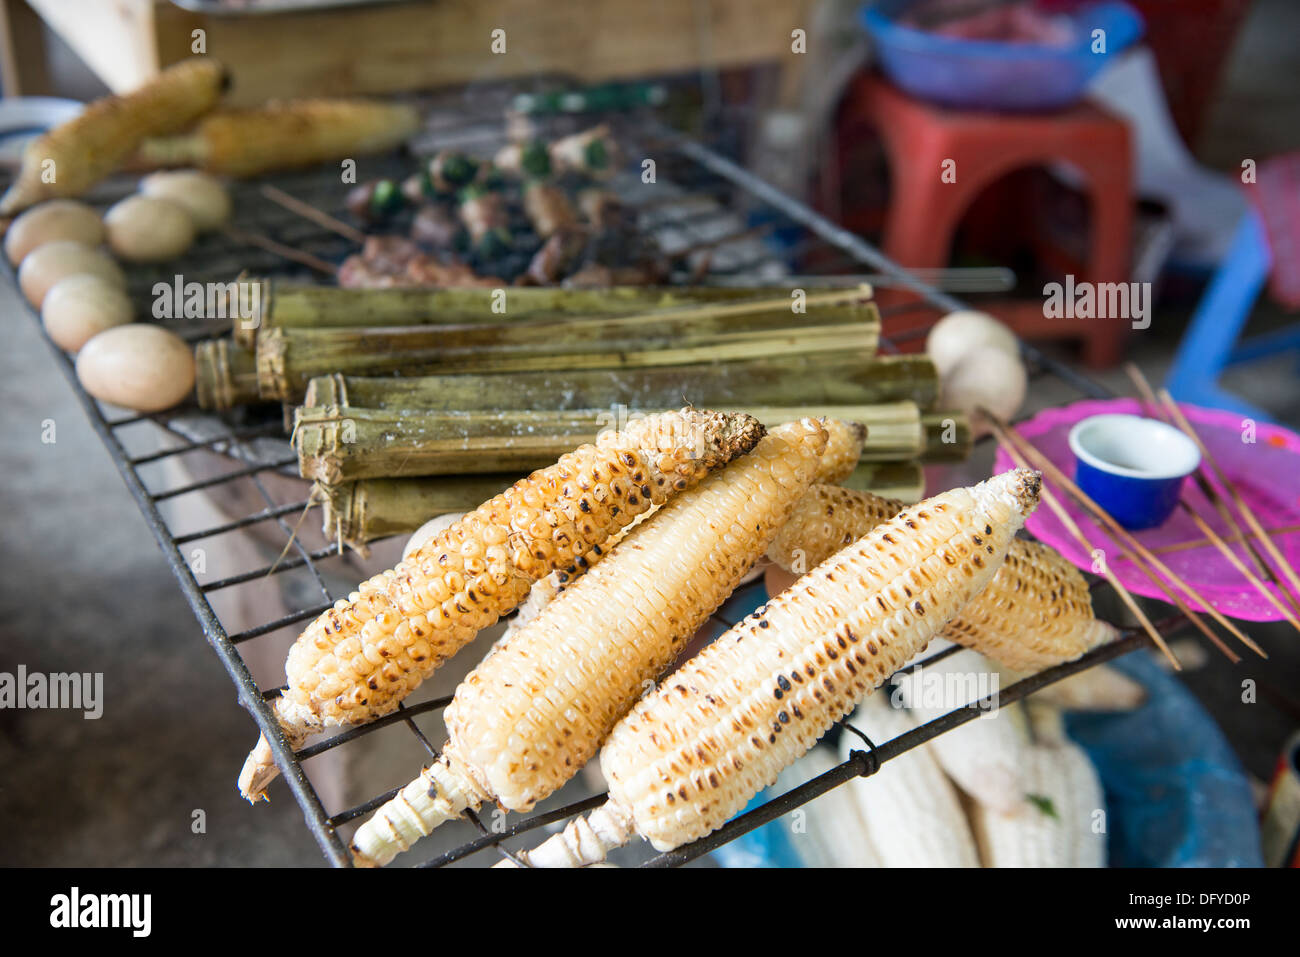 Vietnamese people sell the grill corn near the tourist sight , Sa Pa, Lao Cai, Vietnam - Stock Image